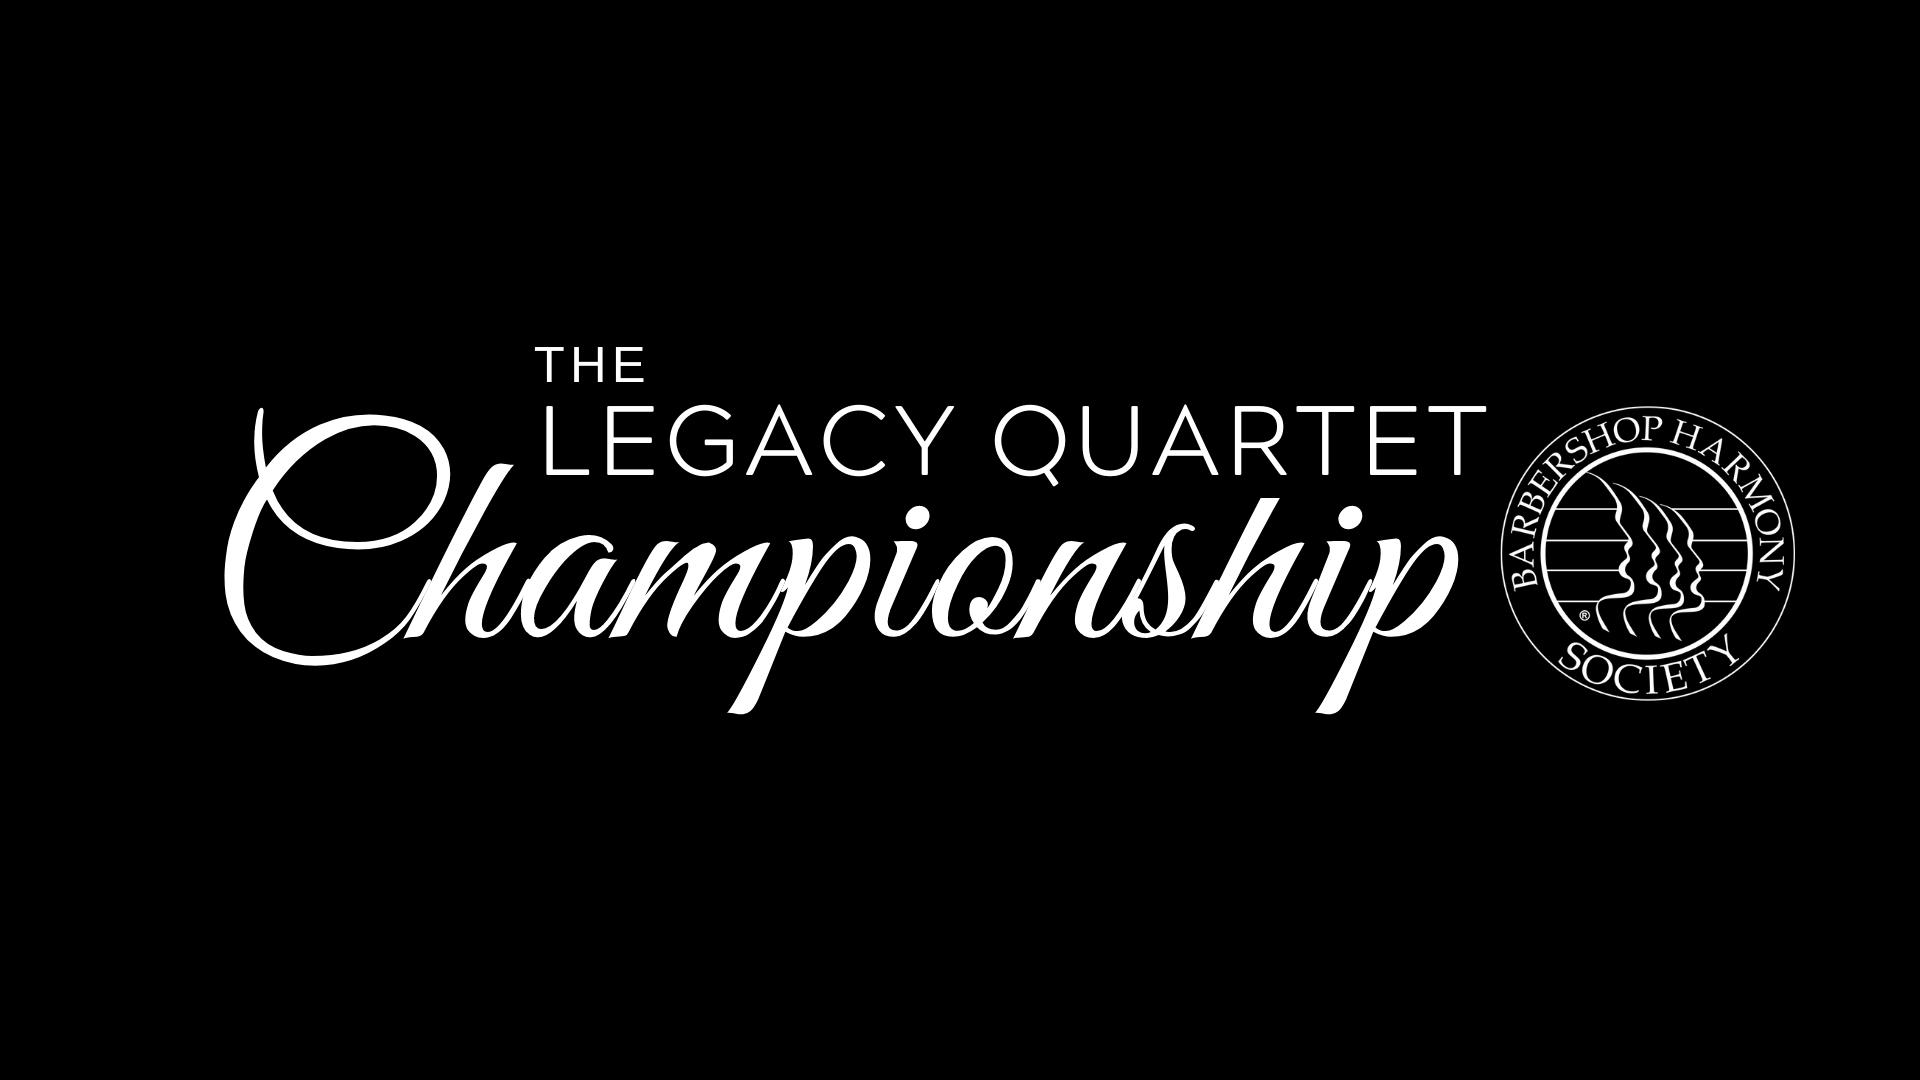 Legacy Quartet Championship